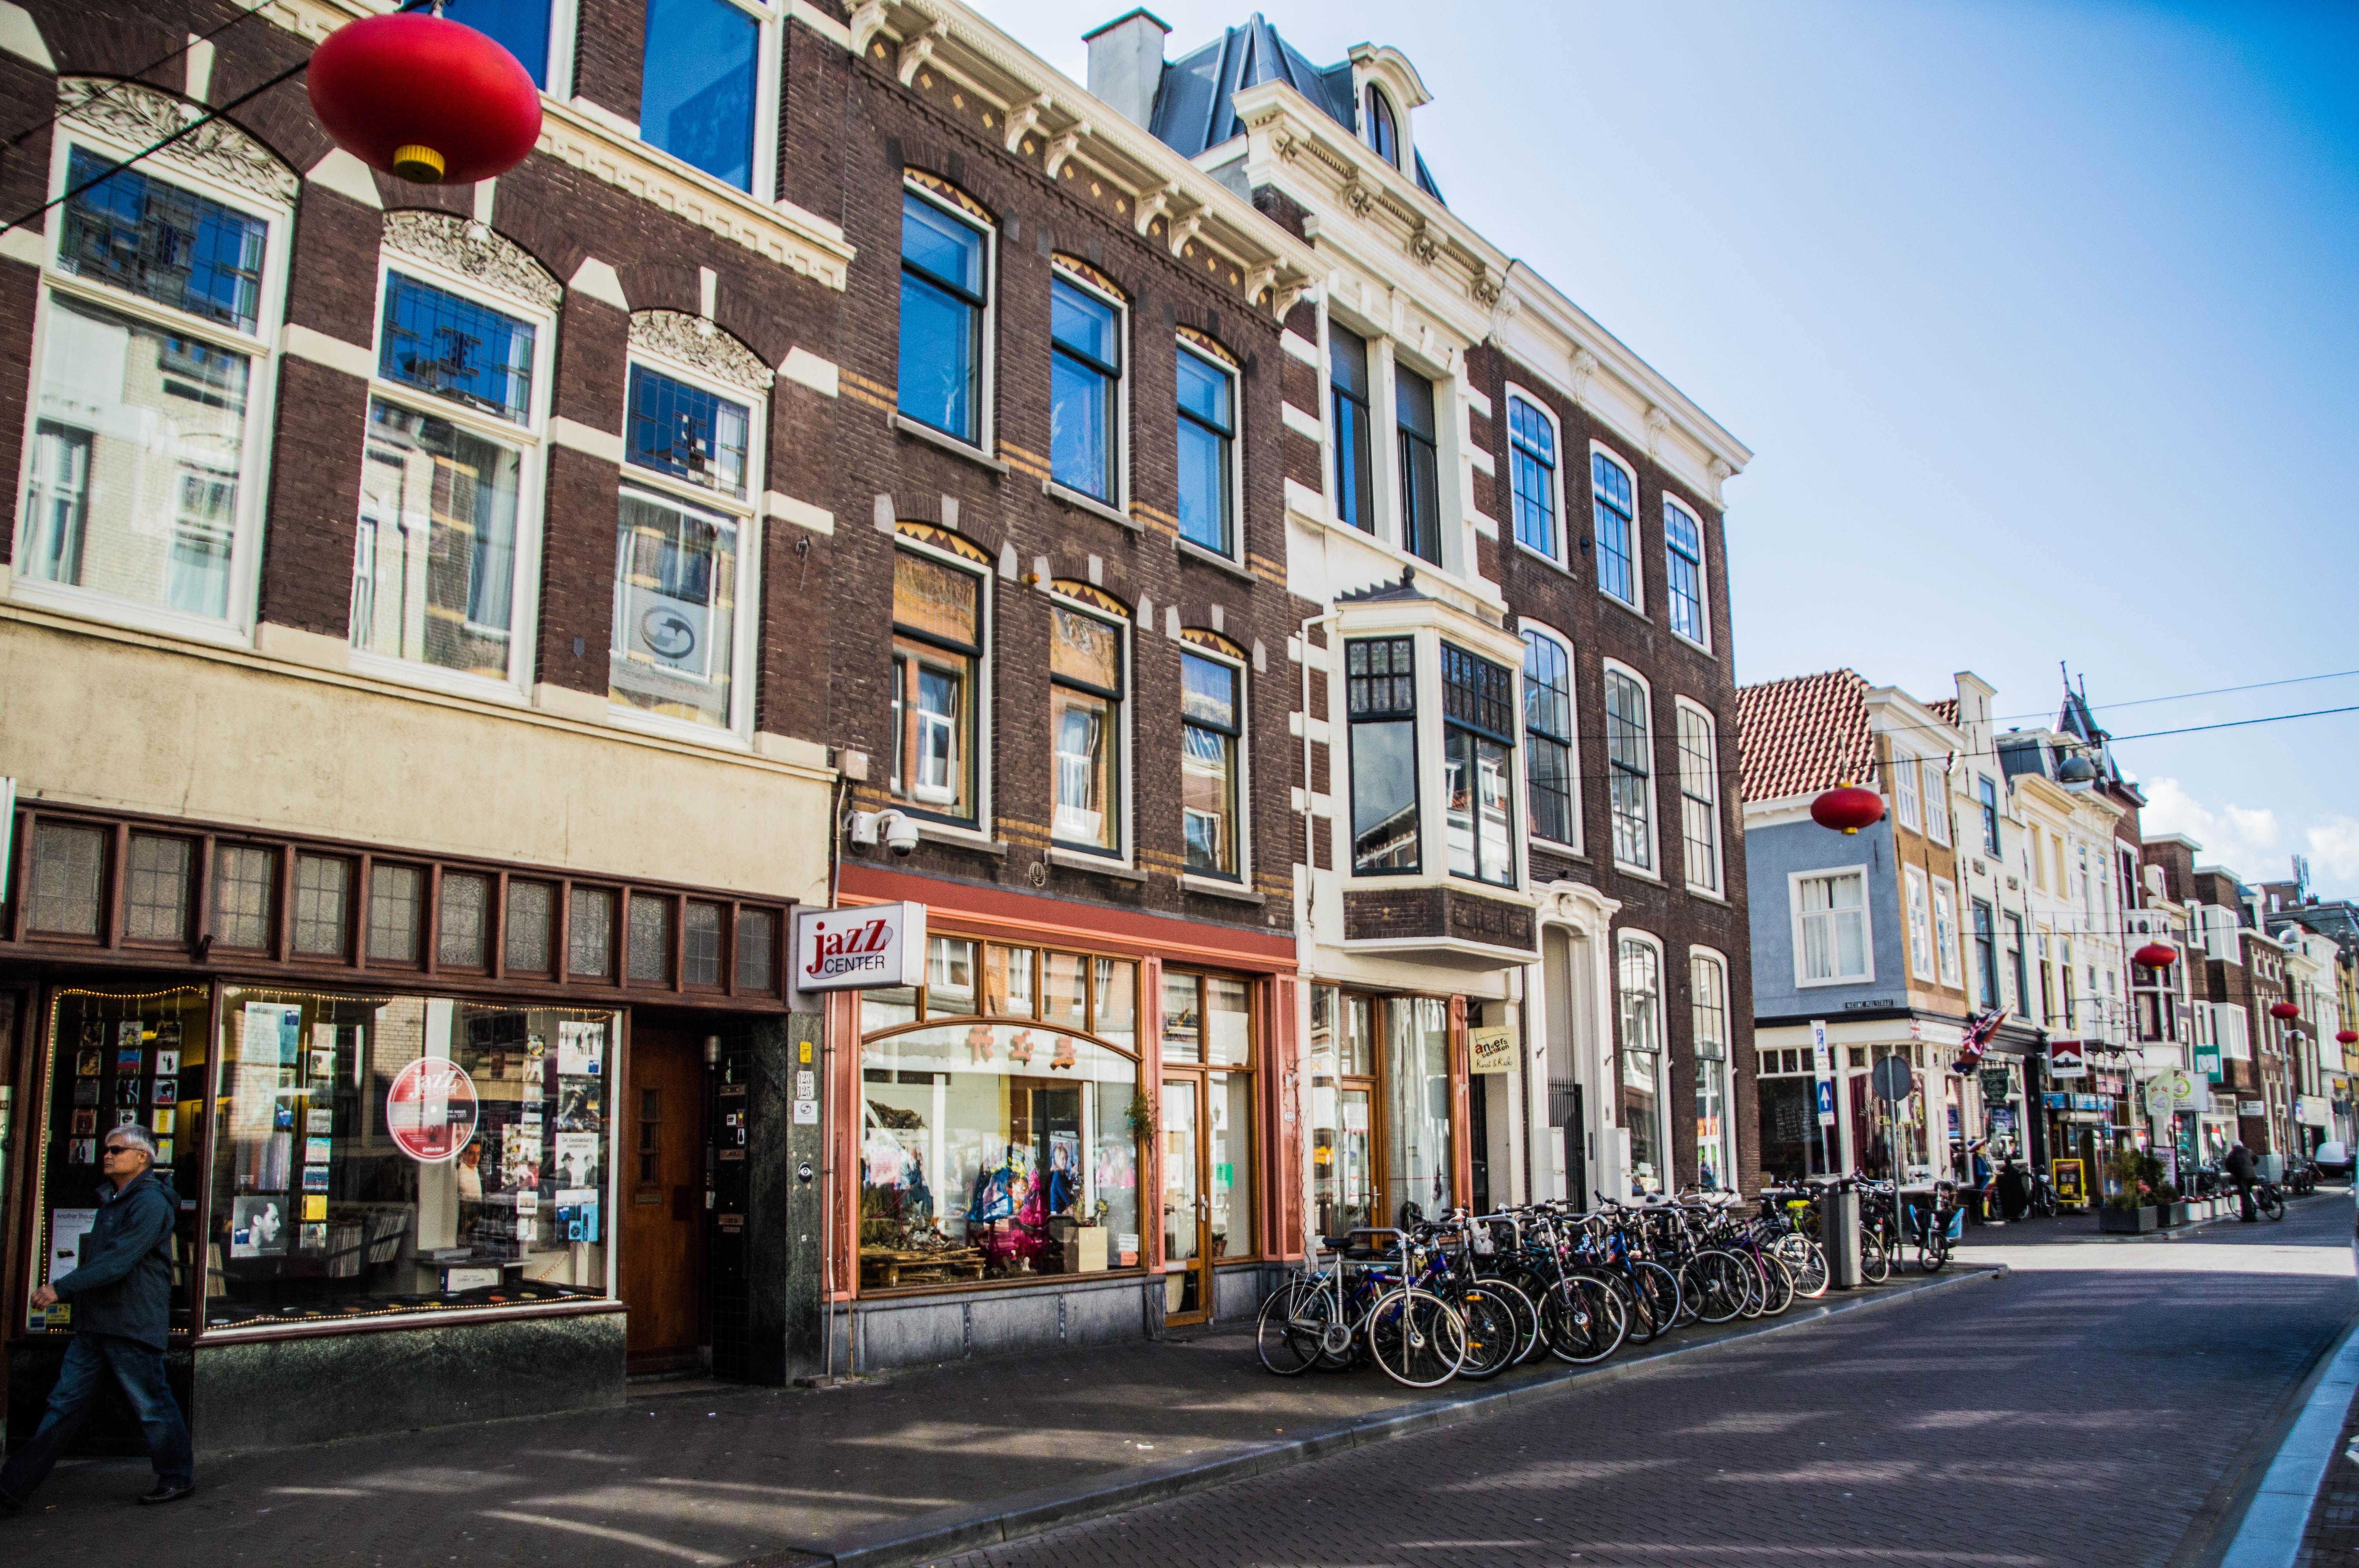 Ville La Haye Pays Bas